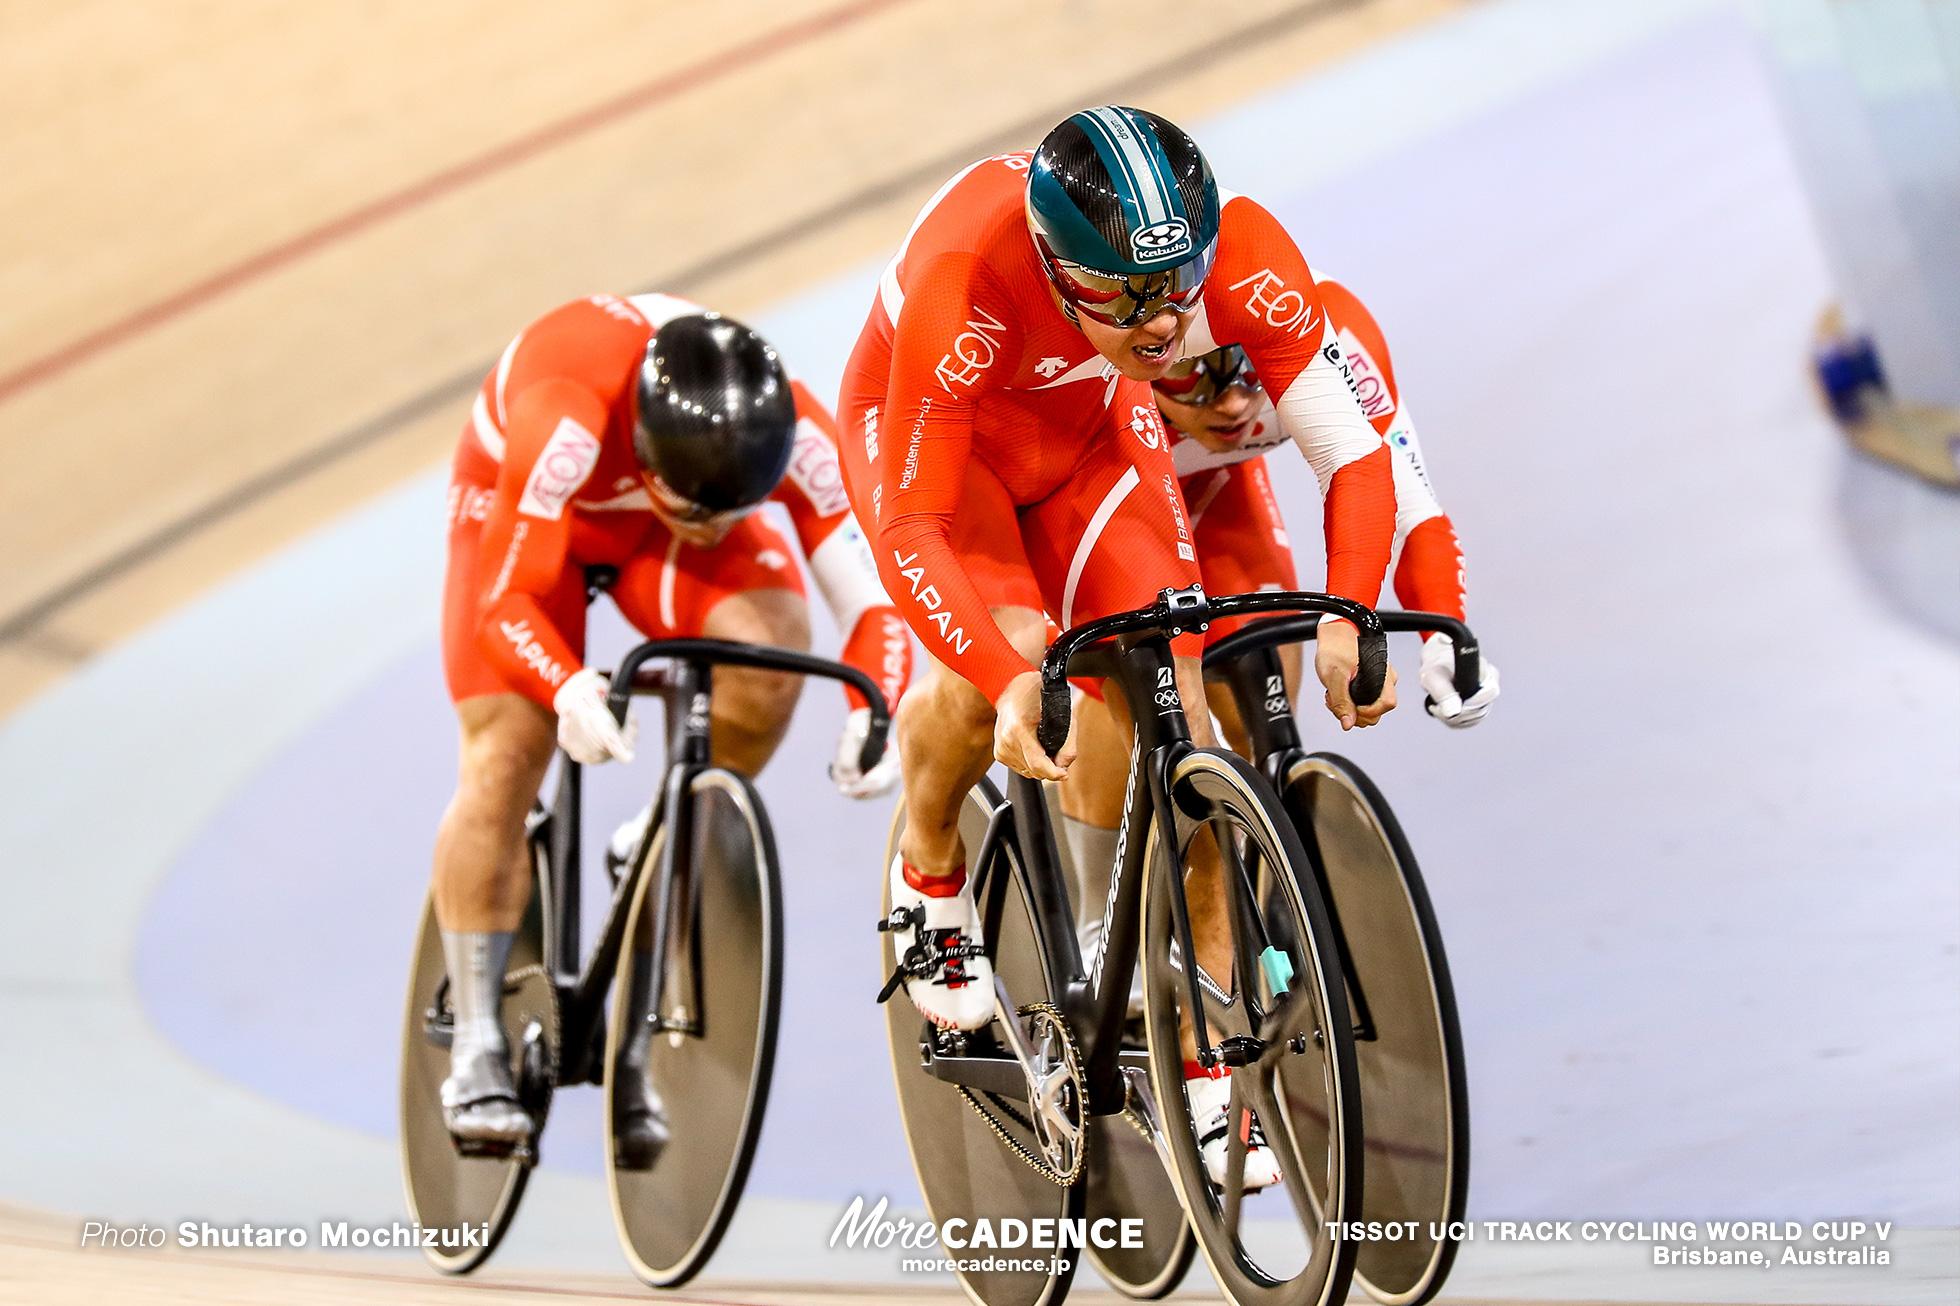 Qualifying / Men's Team Sprint / TISSOT UCI TRACK CYCLING WORLD CUP V, Brisbane, Australia